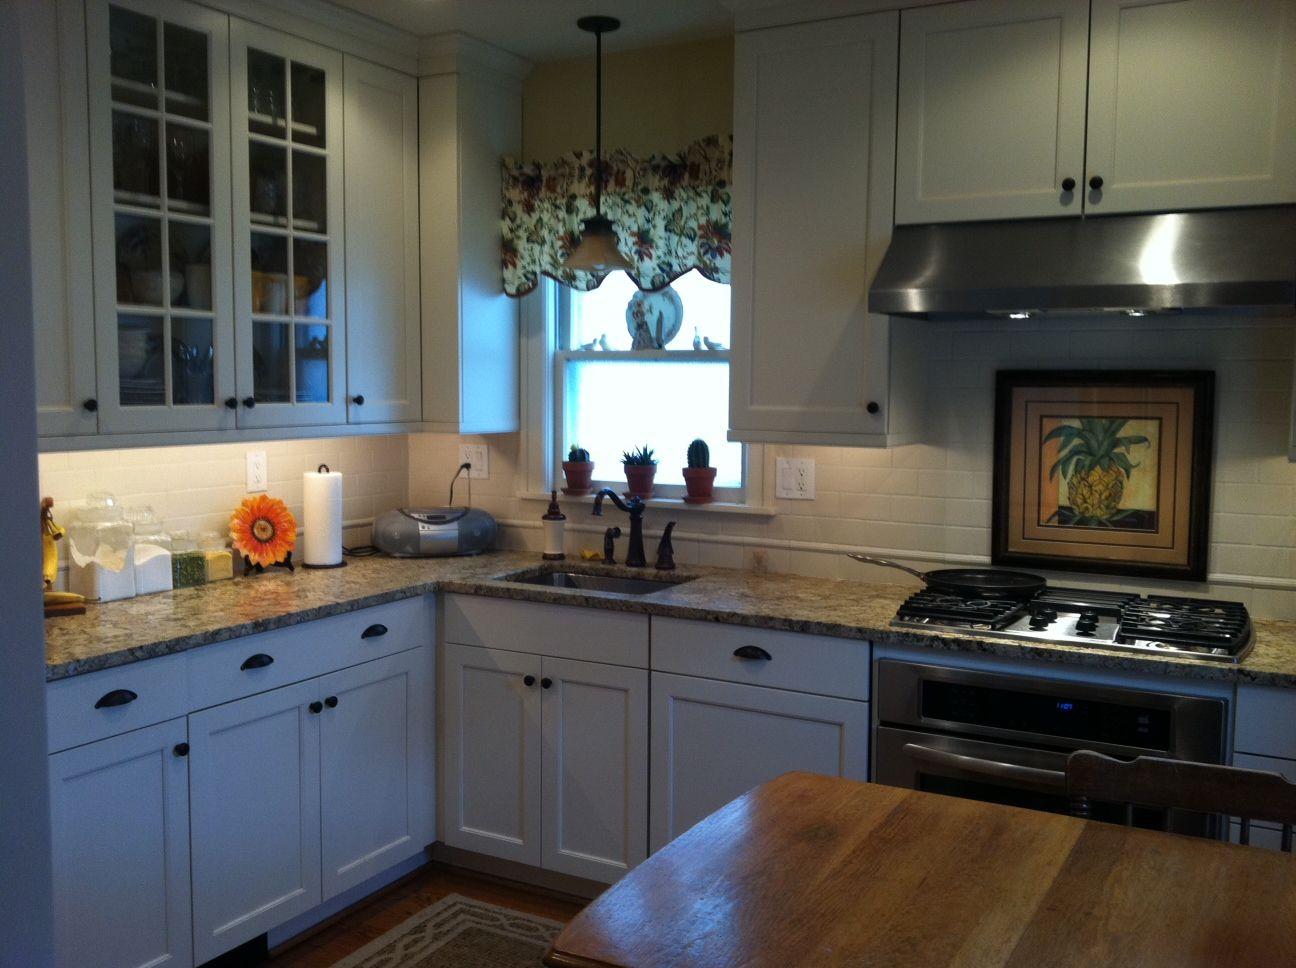 Kitchen Remodel Brookhaven Cabinetry Edgemont Recessed Antique White On Maple Kitchen Remodel Kitchen Kitchen Cabinets